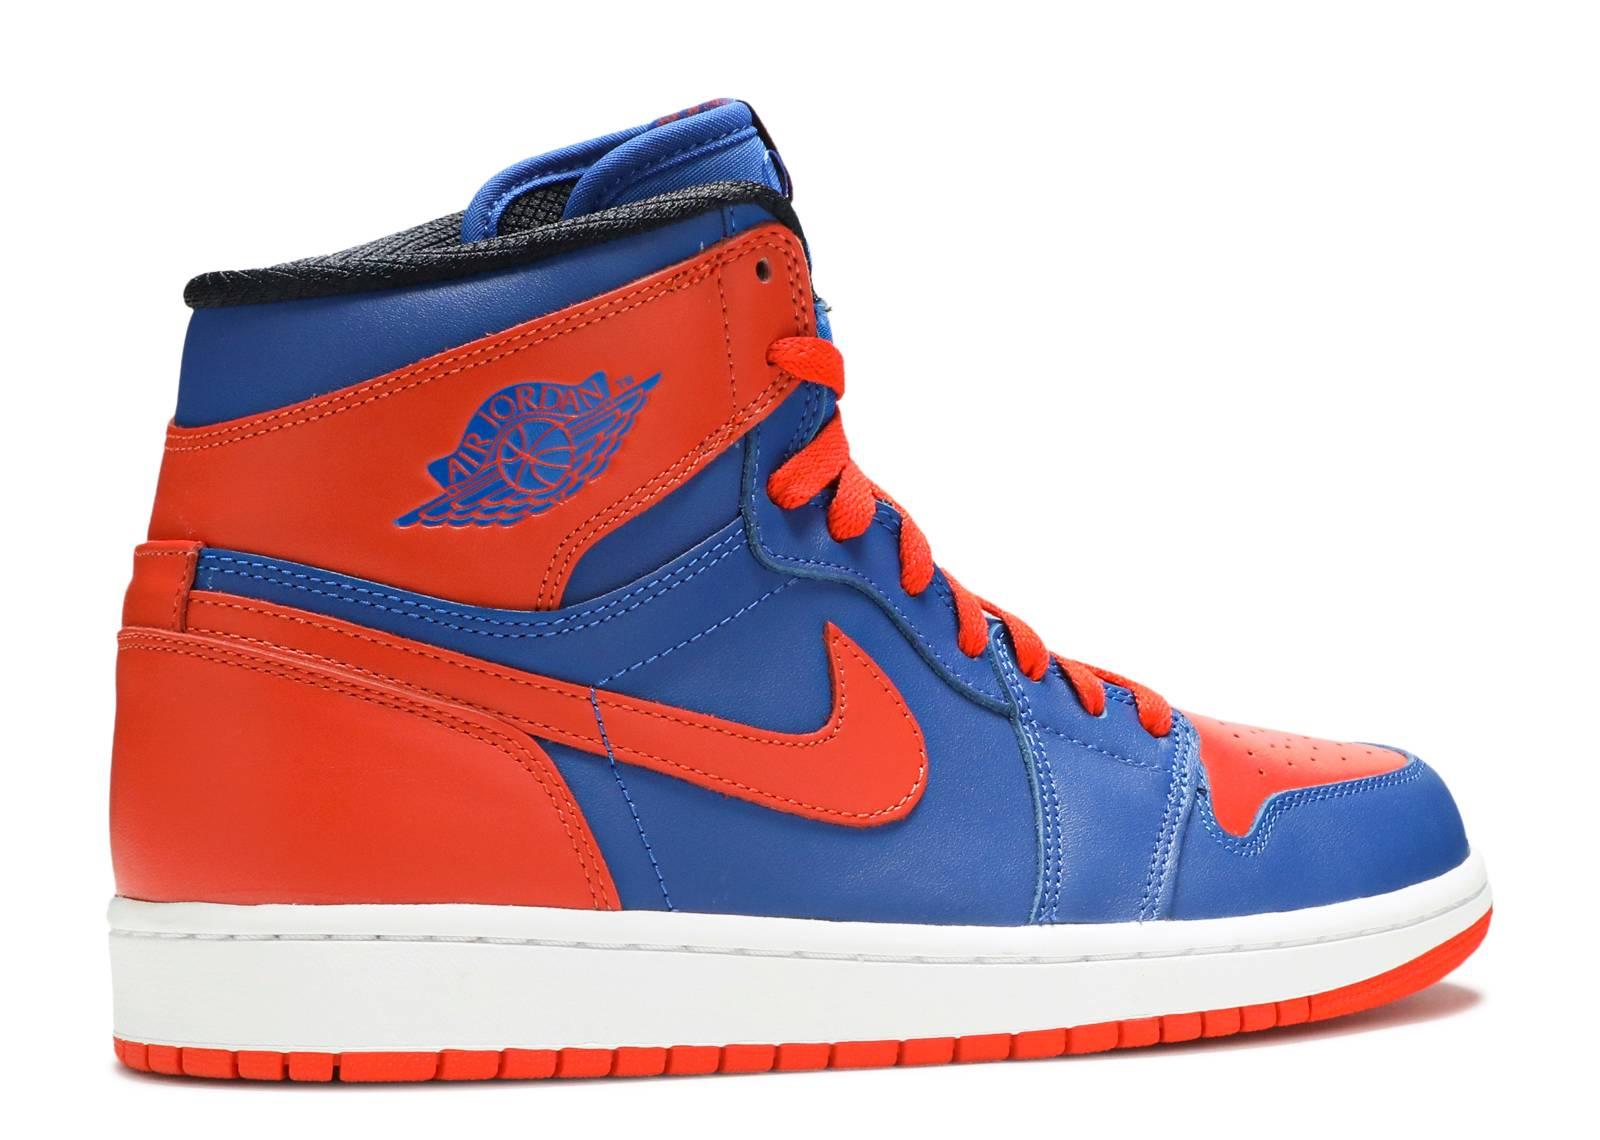 Air Jordan 1 Retro High Og Blue And Orange